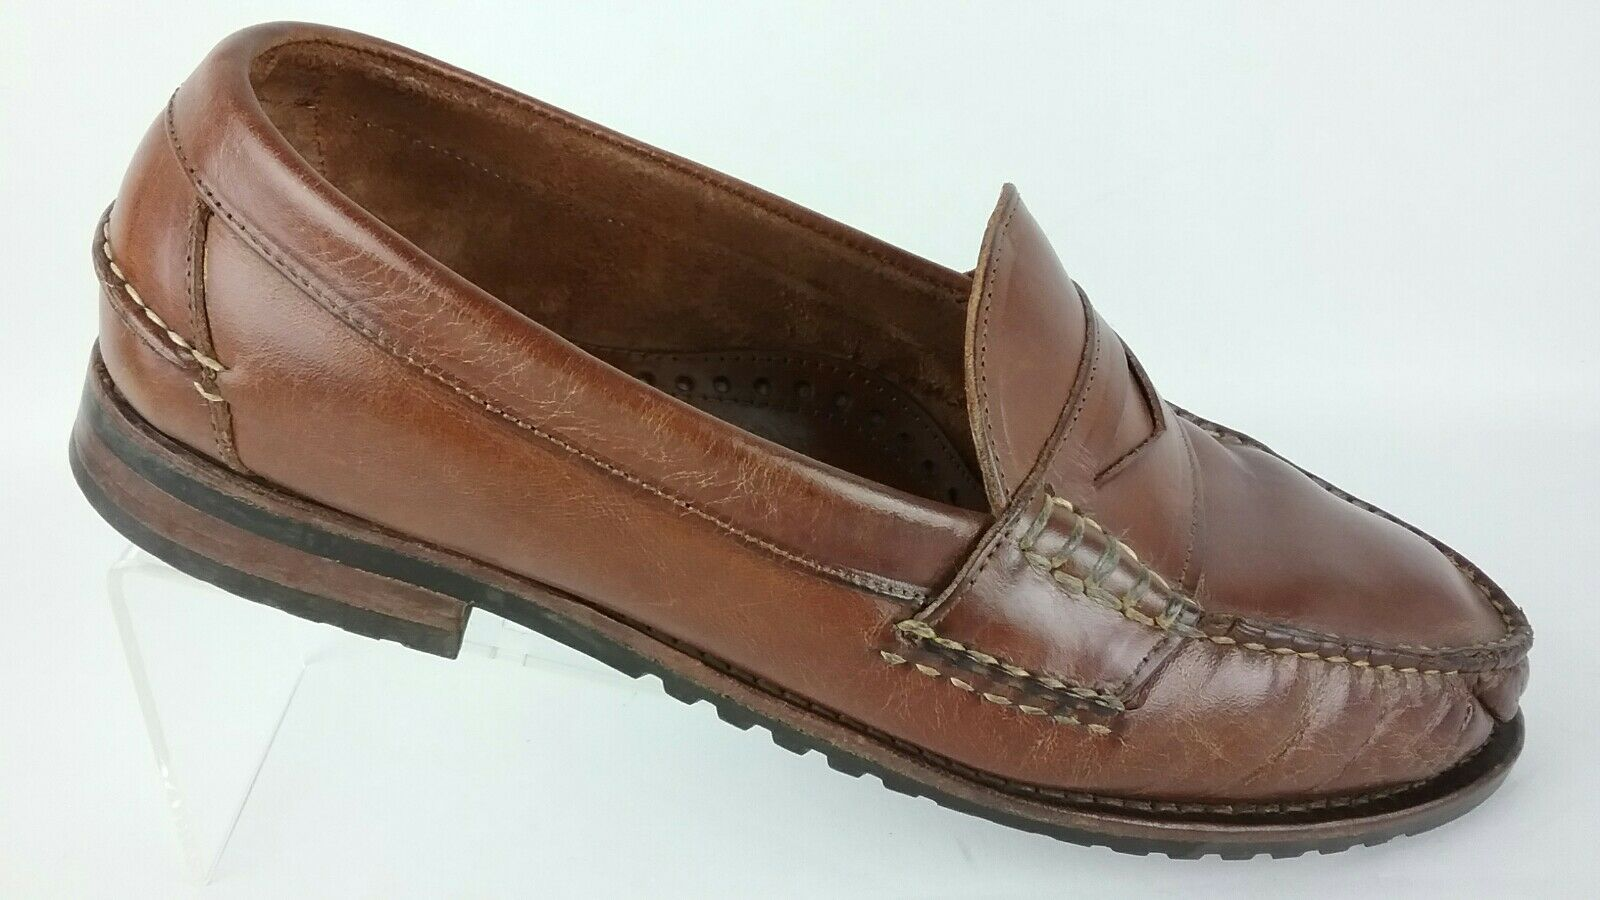 Allen Edmonds Coppell Men's Moc Toe Driving Penny Loafer Brown shoes R2S4